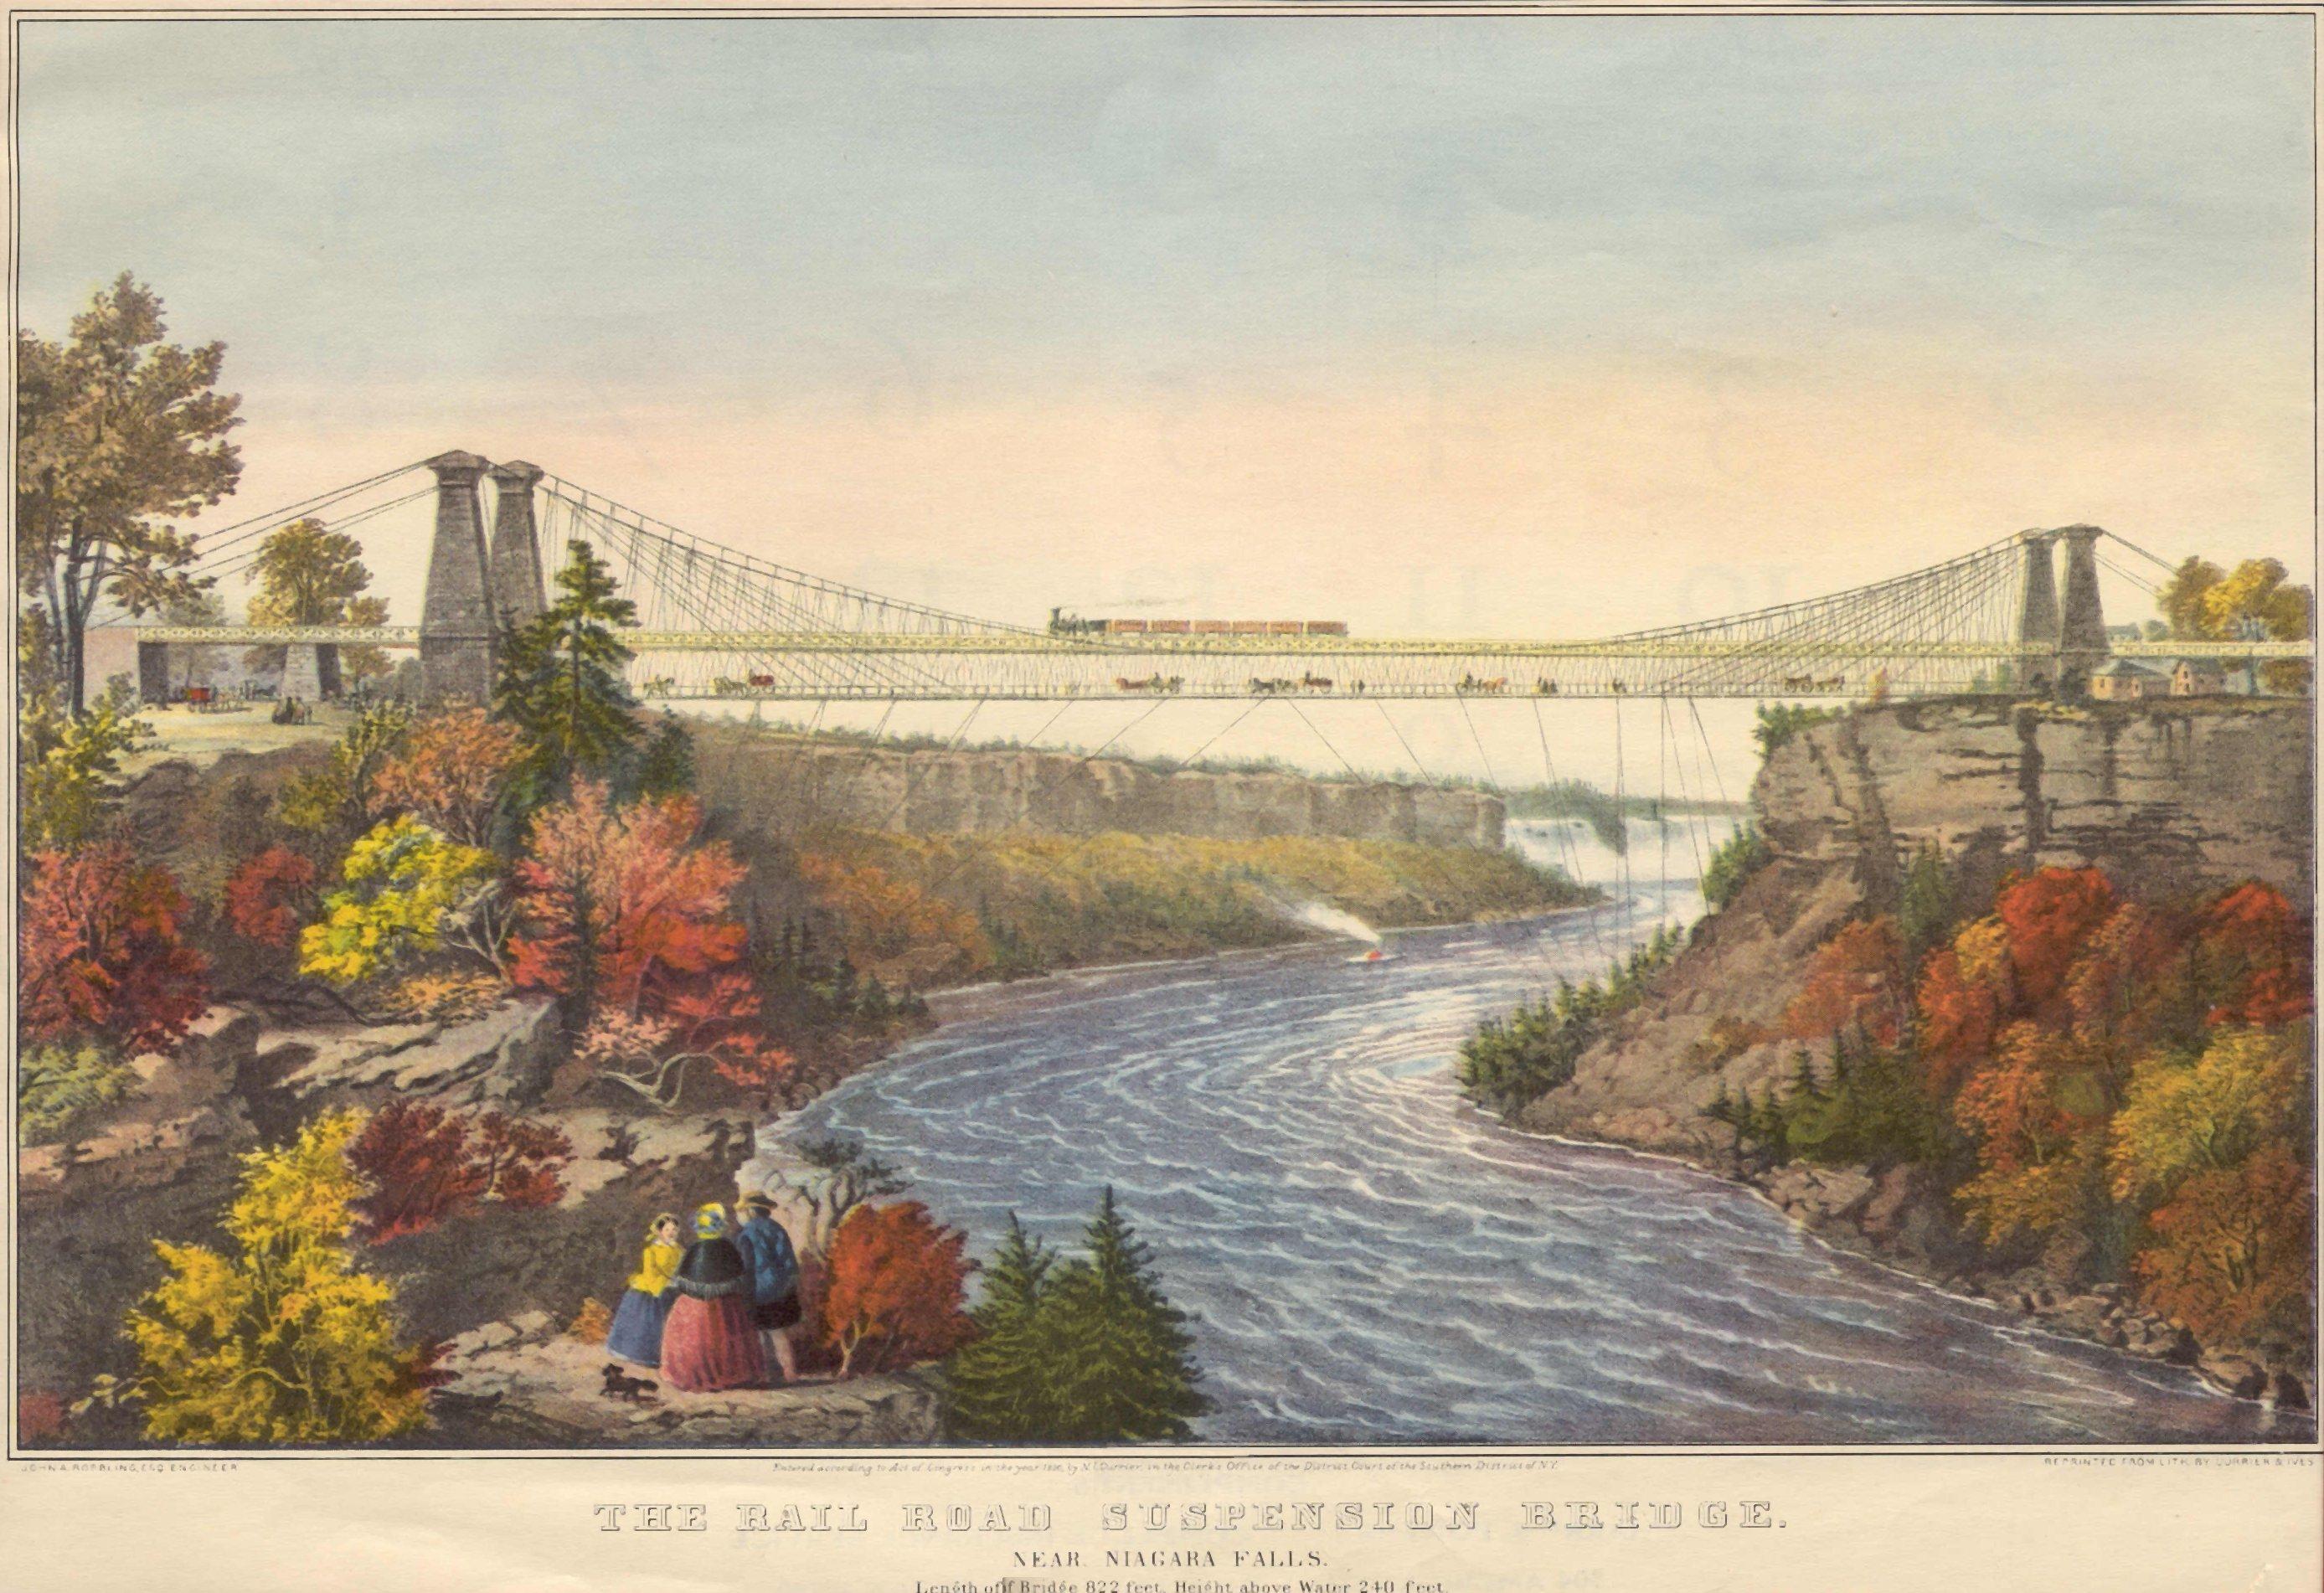 Rail_Road_Suspension_Bridge_Near_Niagara_Falls_v2 2002 ford focus fuse diagram 19 on 2002 ford focus fuse diagram